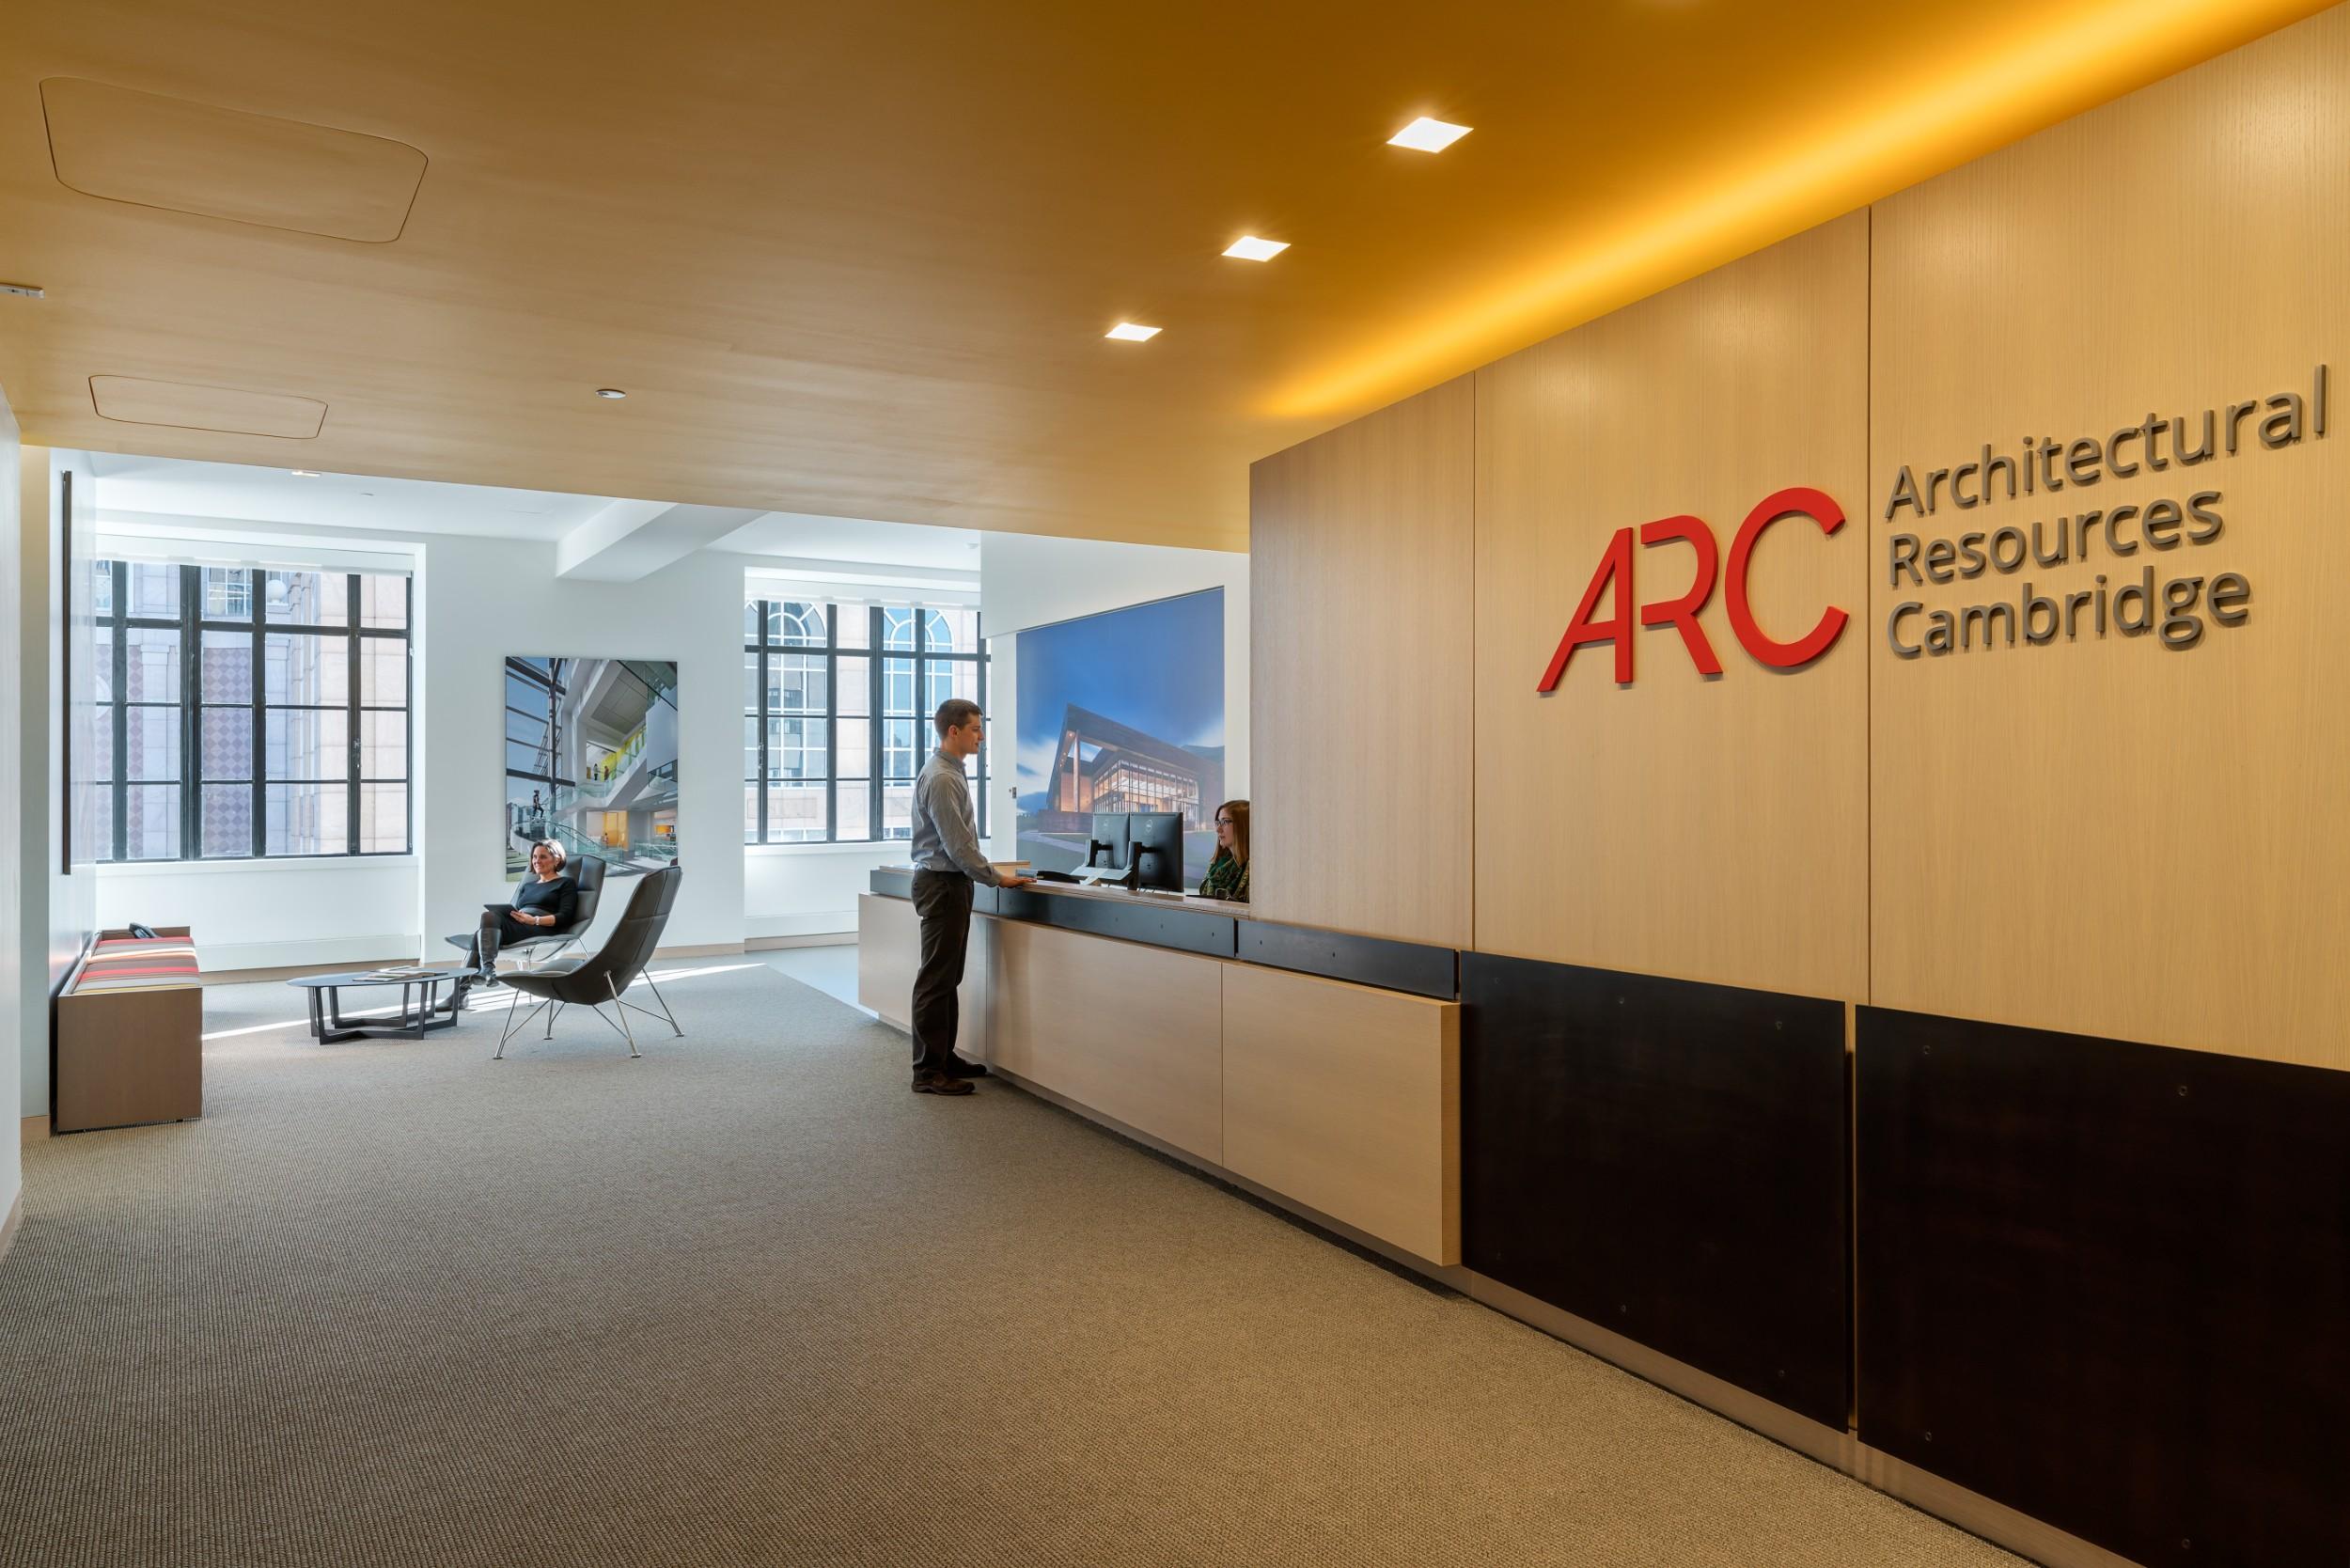 ARC_Architectural_Resources_Cambridge_Boston_Office_Back_Bay_Corderman_Construction_Reception.jpg